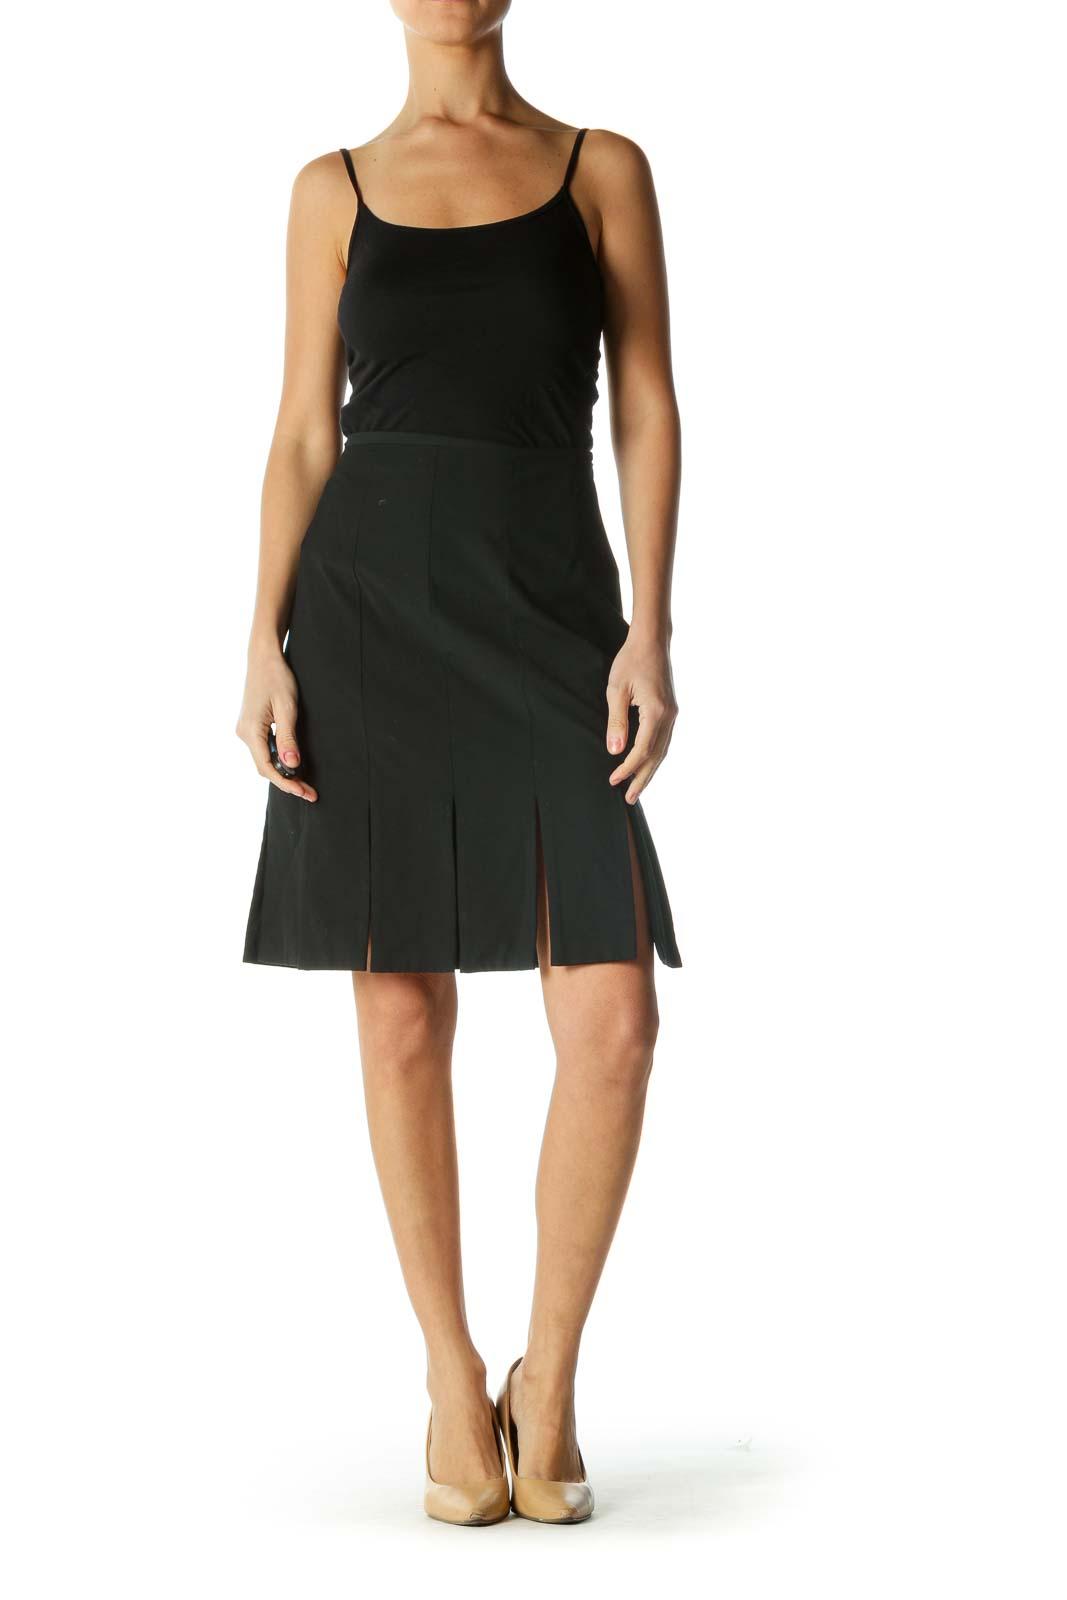 Black Pencil Skirt Cutout